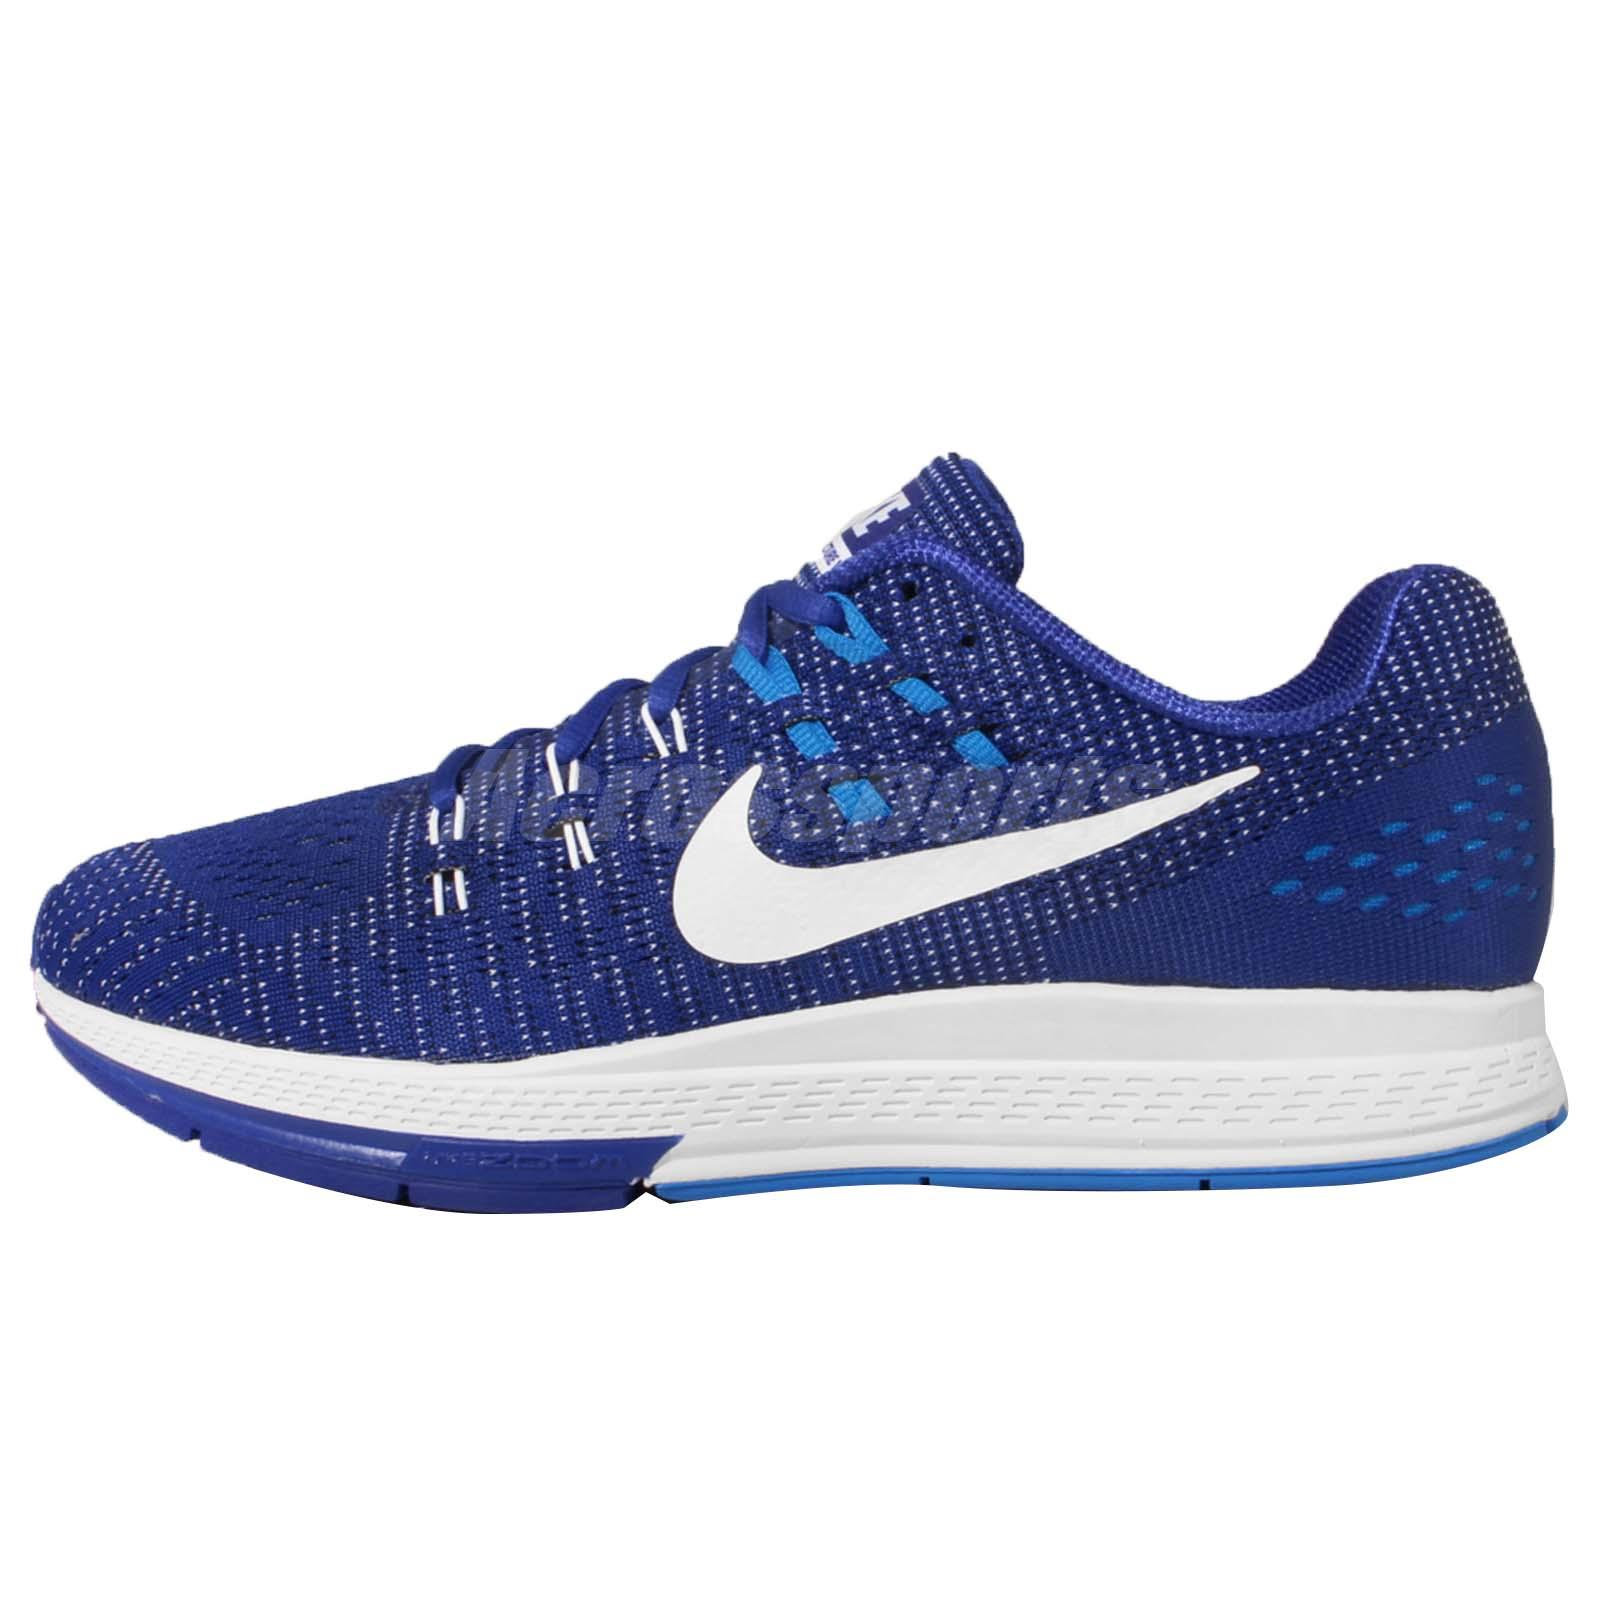 2be3dba57136 Nike Air Zoom Pegasus 33 Men s Running Shoes Team Orange. Hello +Potomac  River ...